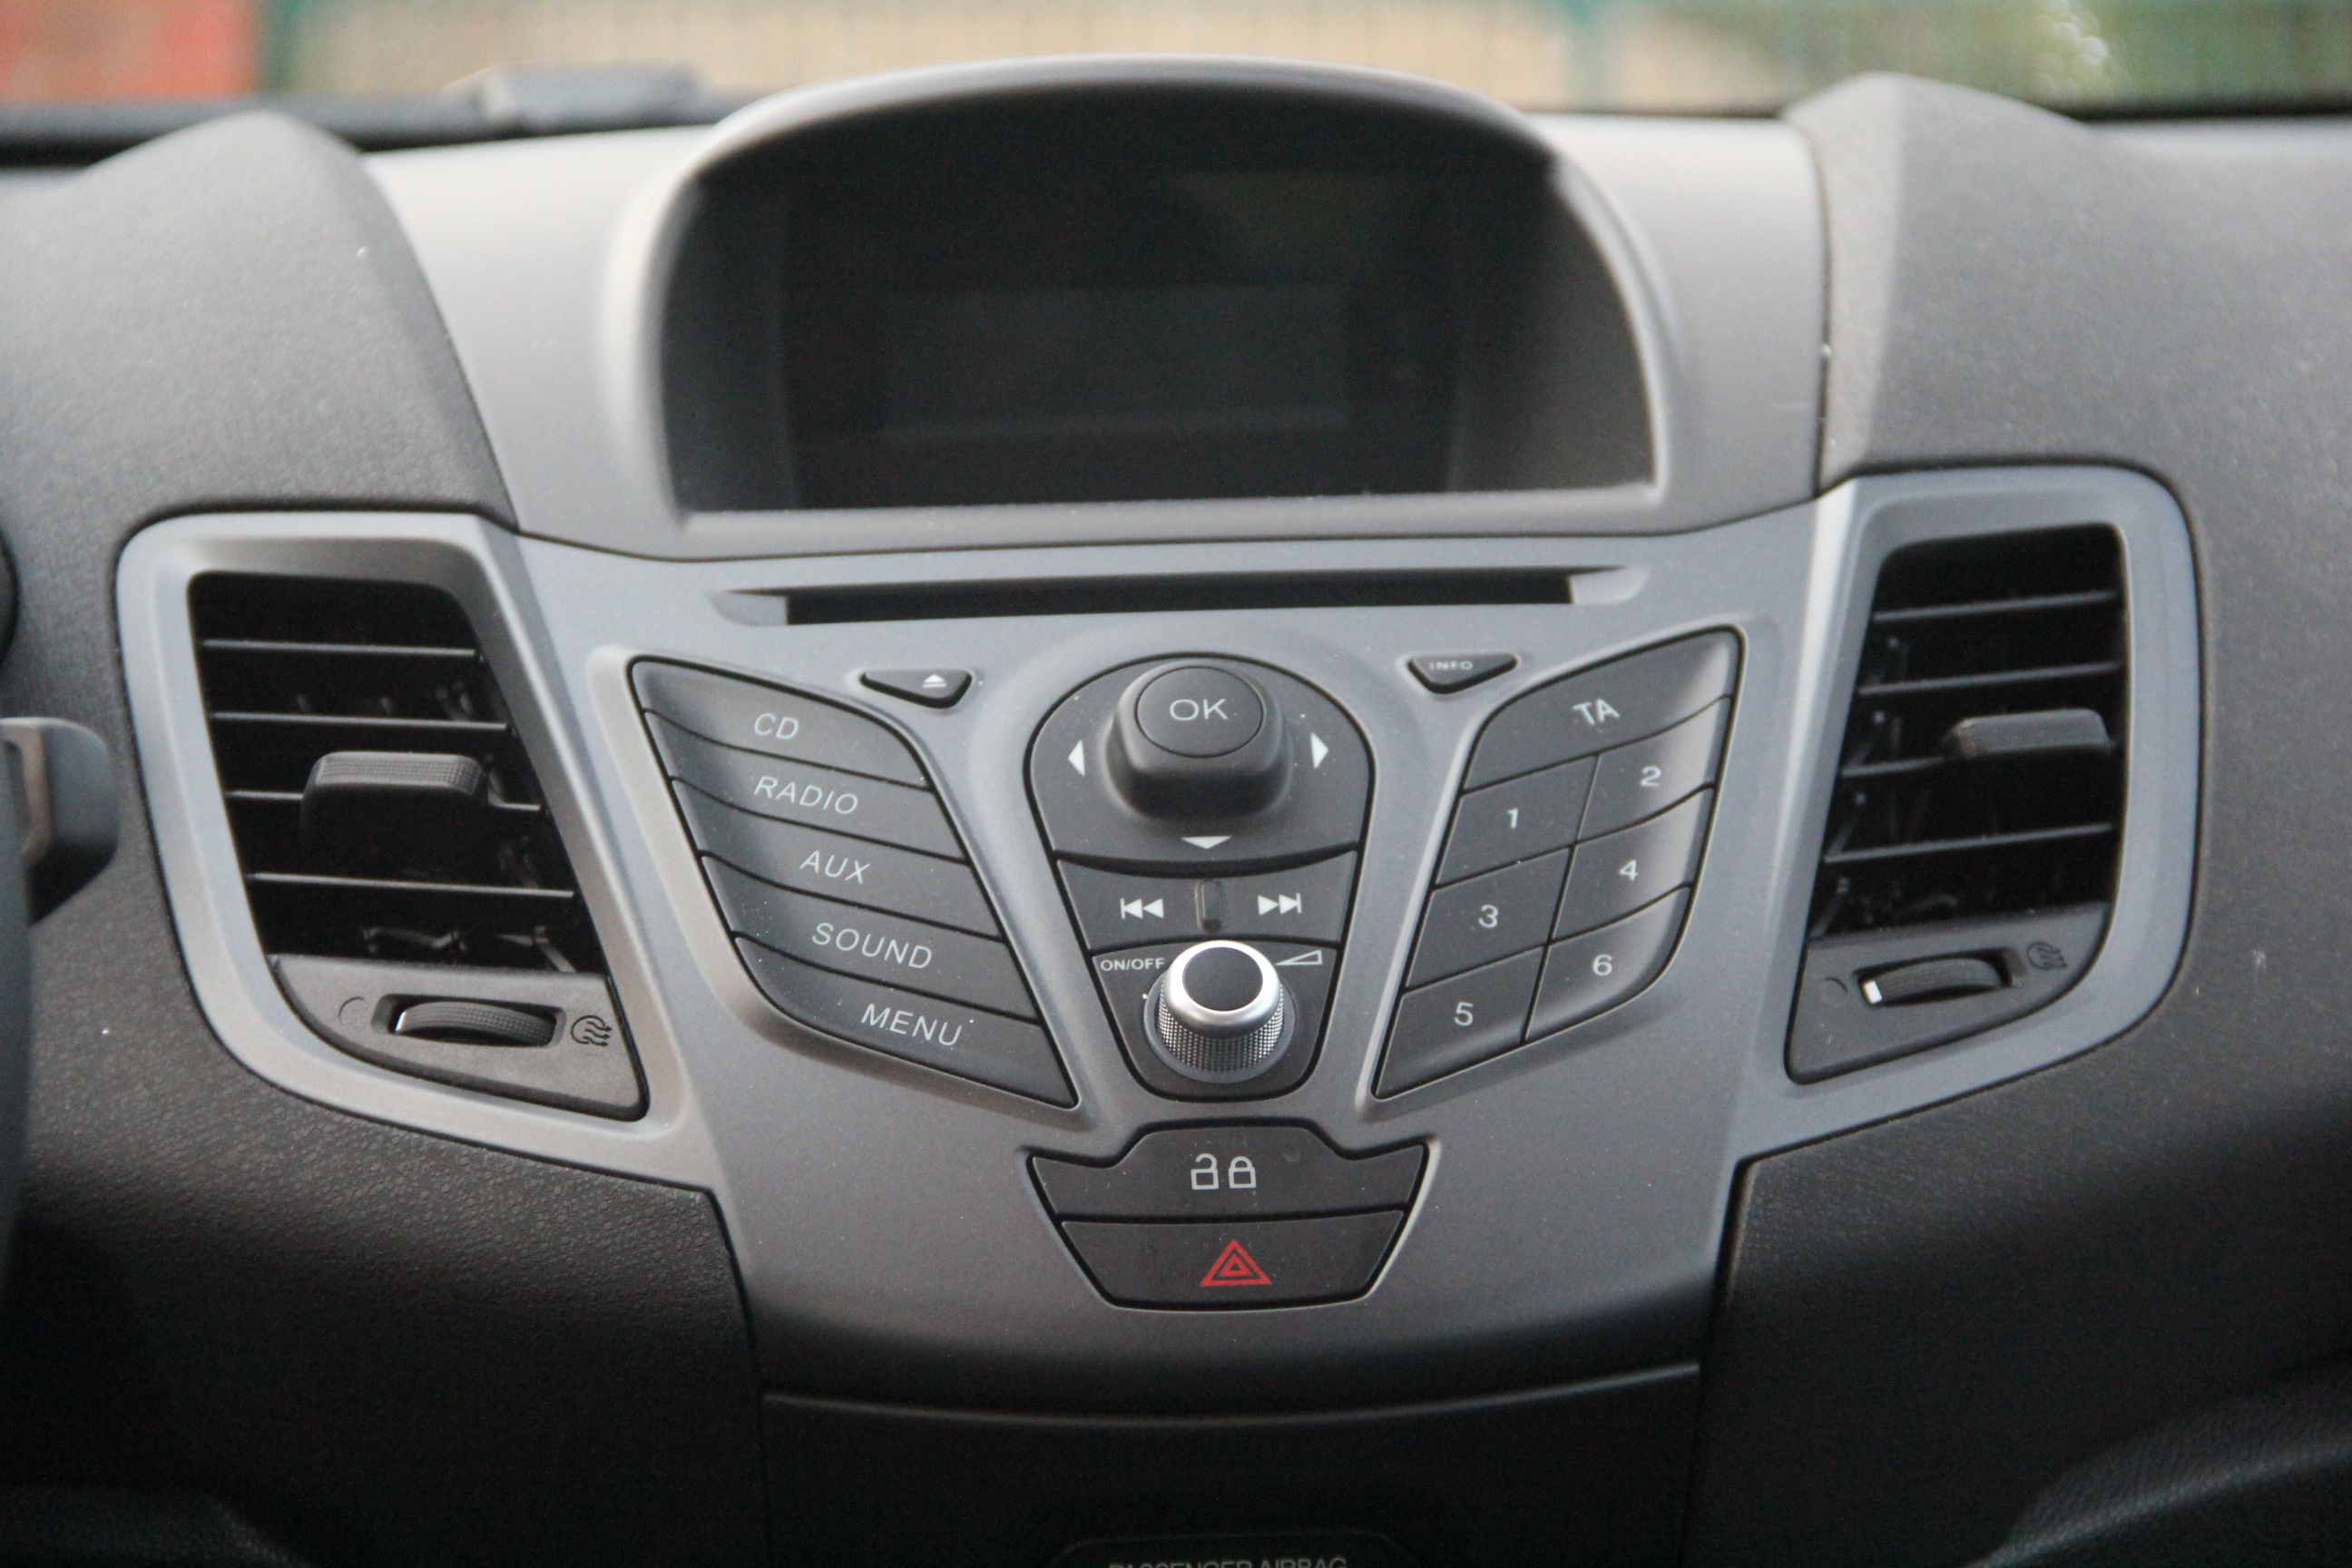 Vieux Pick Up Ford Americain Occasion >> Essai - Ford Fiesta TDCI 75 : un accès privilégié